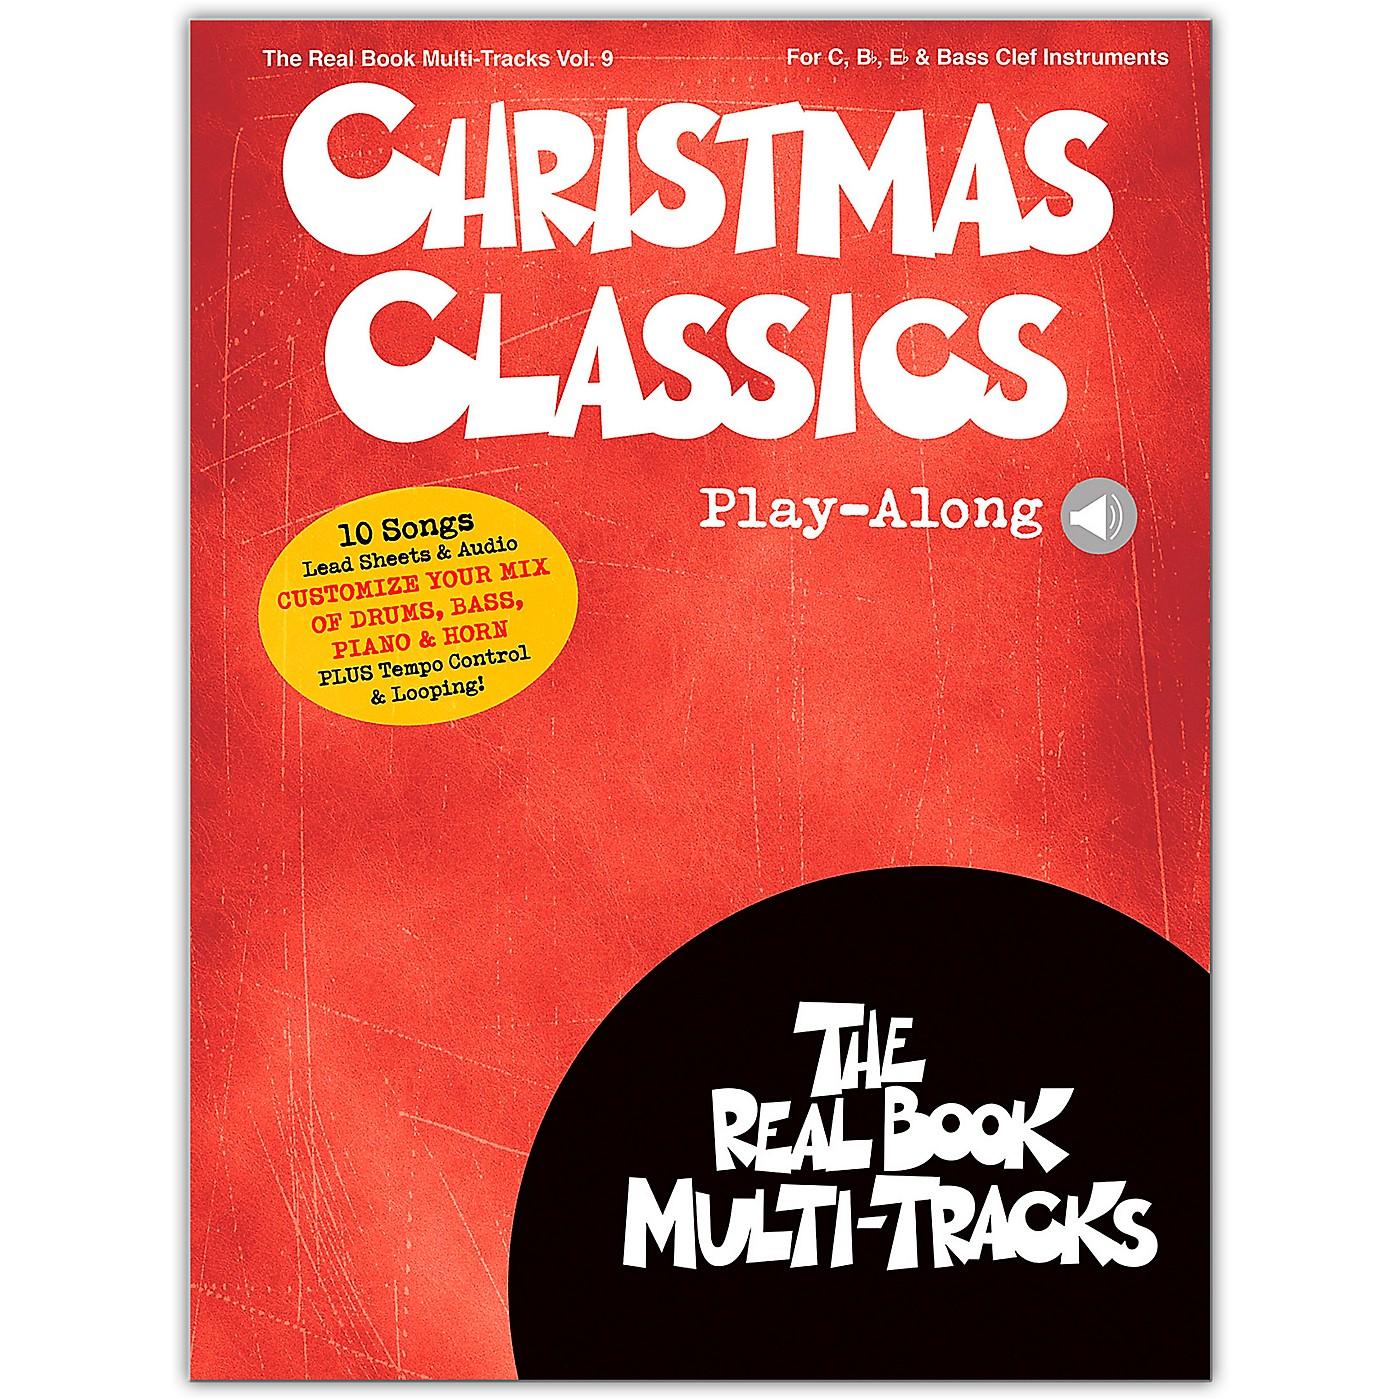 Hal Leonard Christmas Classics Play-Along Real Book Multi-Tracks Volume 9 Book/Audio Online thumbnail